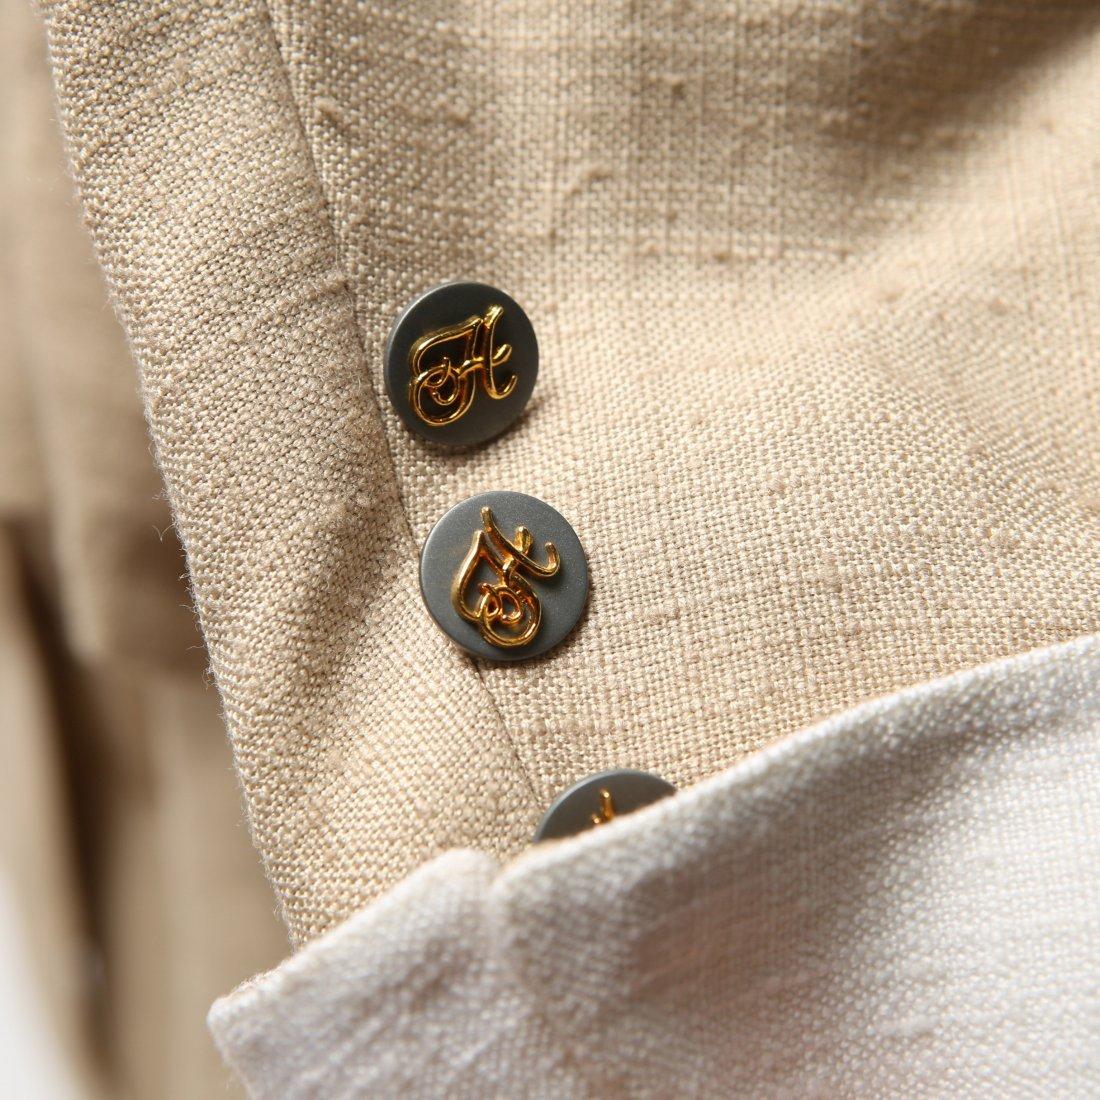 Hermes Woman's Suit / Jacket & Skirt Set, Vintage - 7